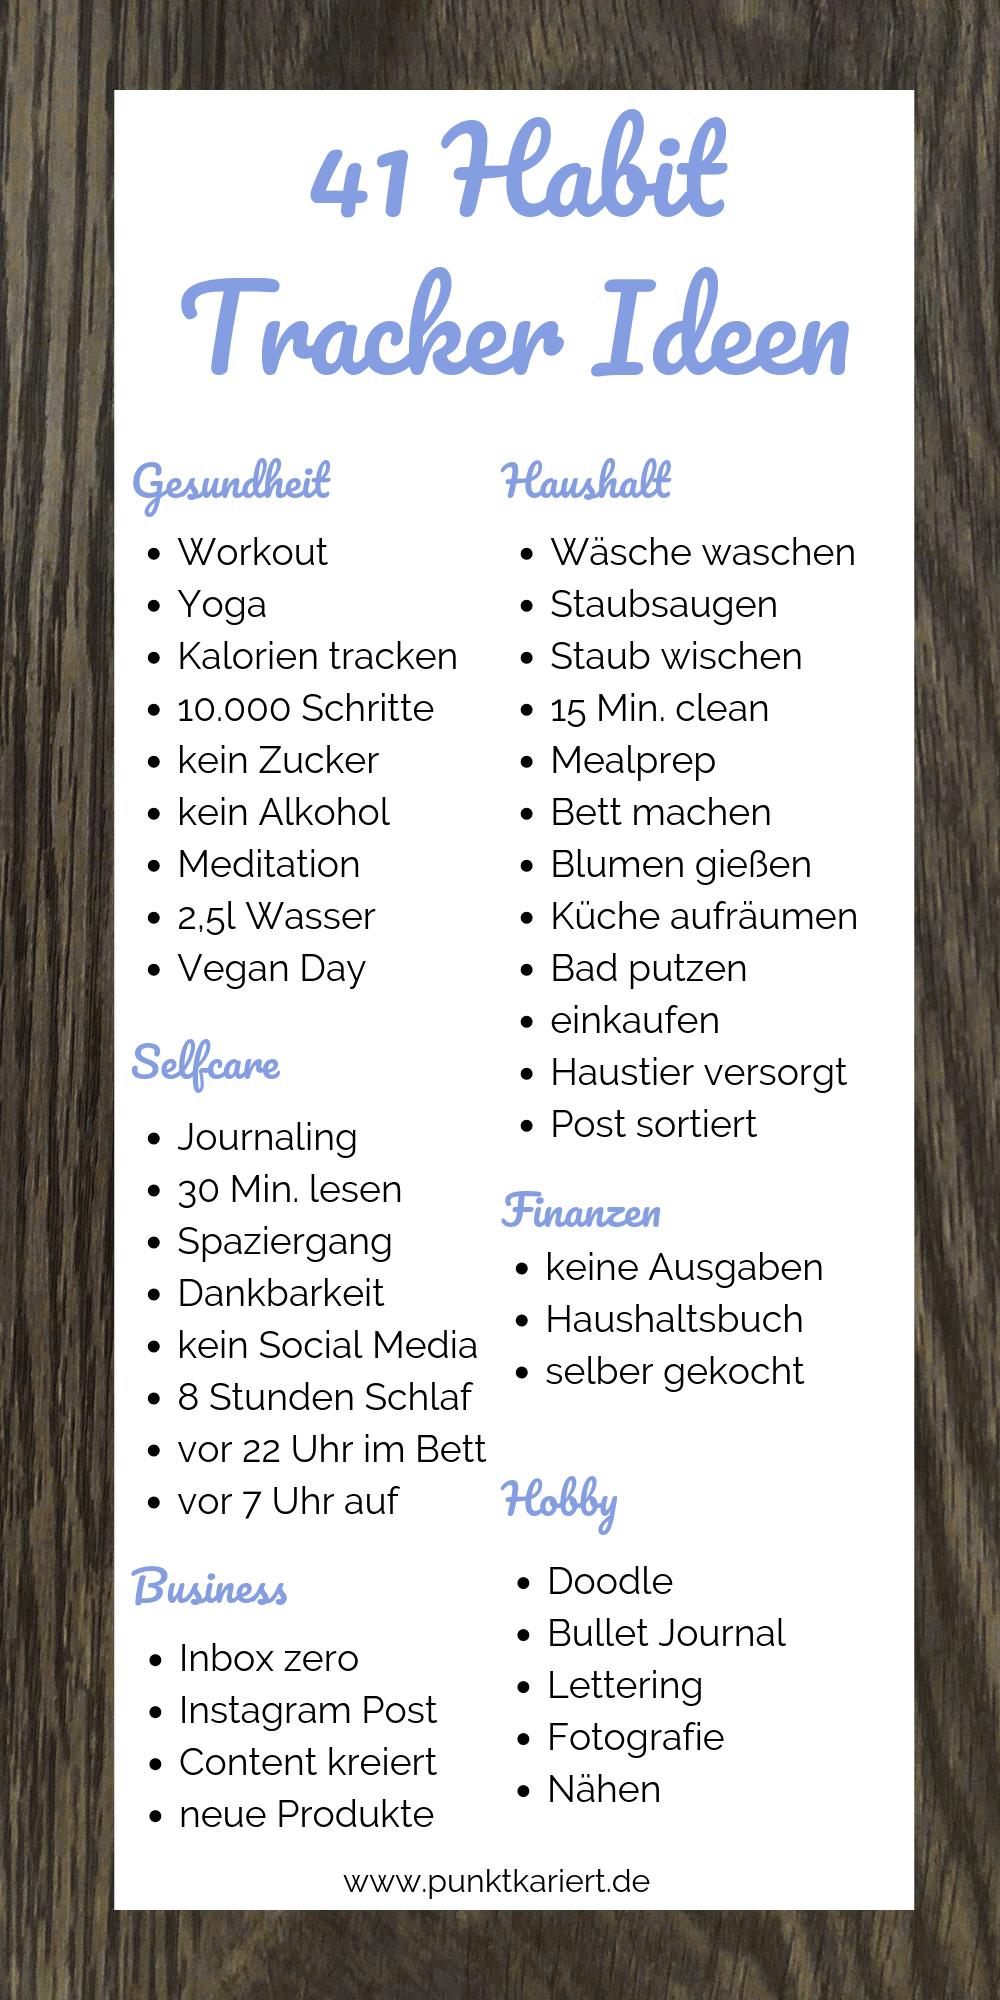 41 Habit Tracker Ideen für dein Bullet Journal #bulletjournal #tracker #fitness inspiration desenho...